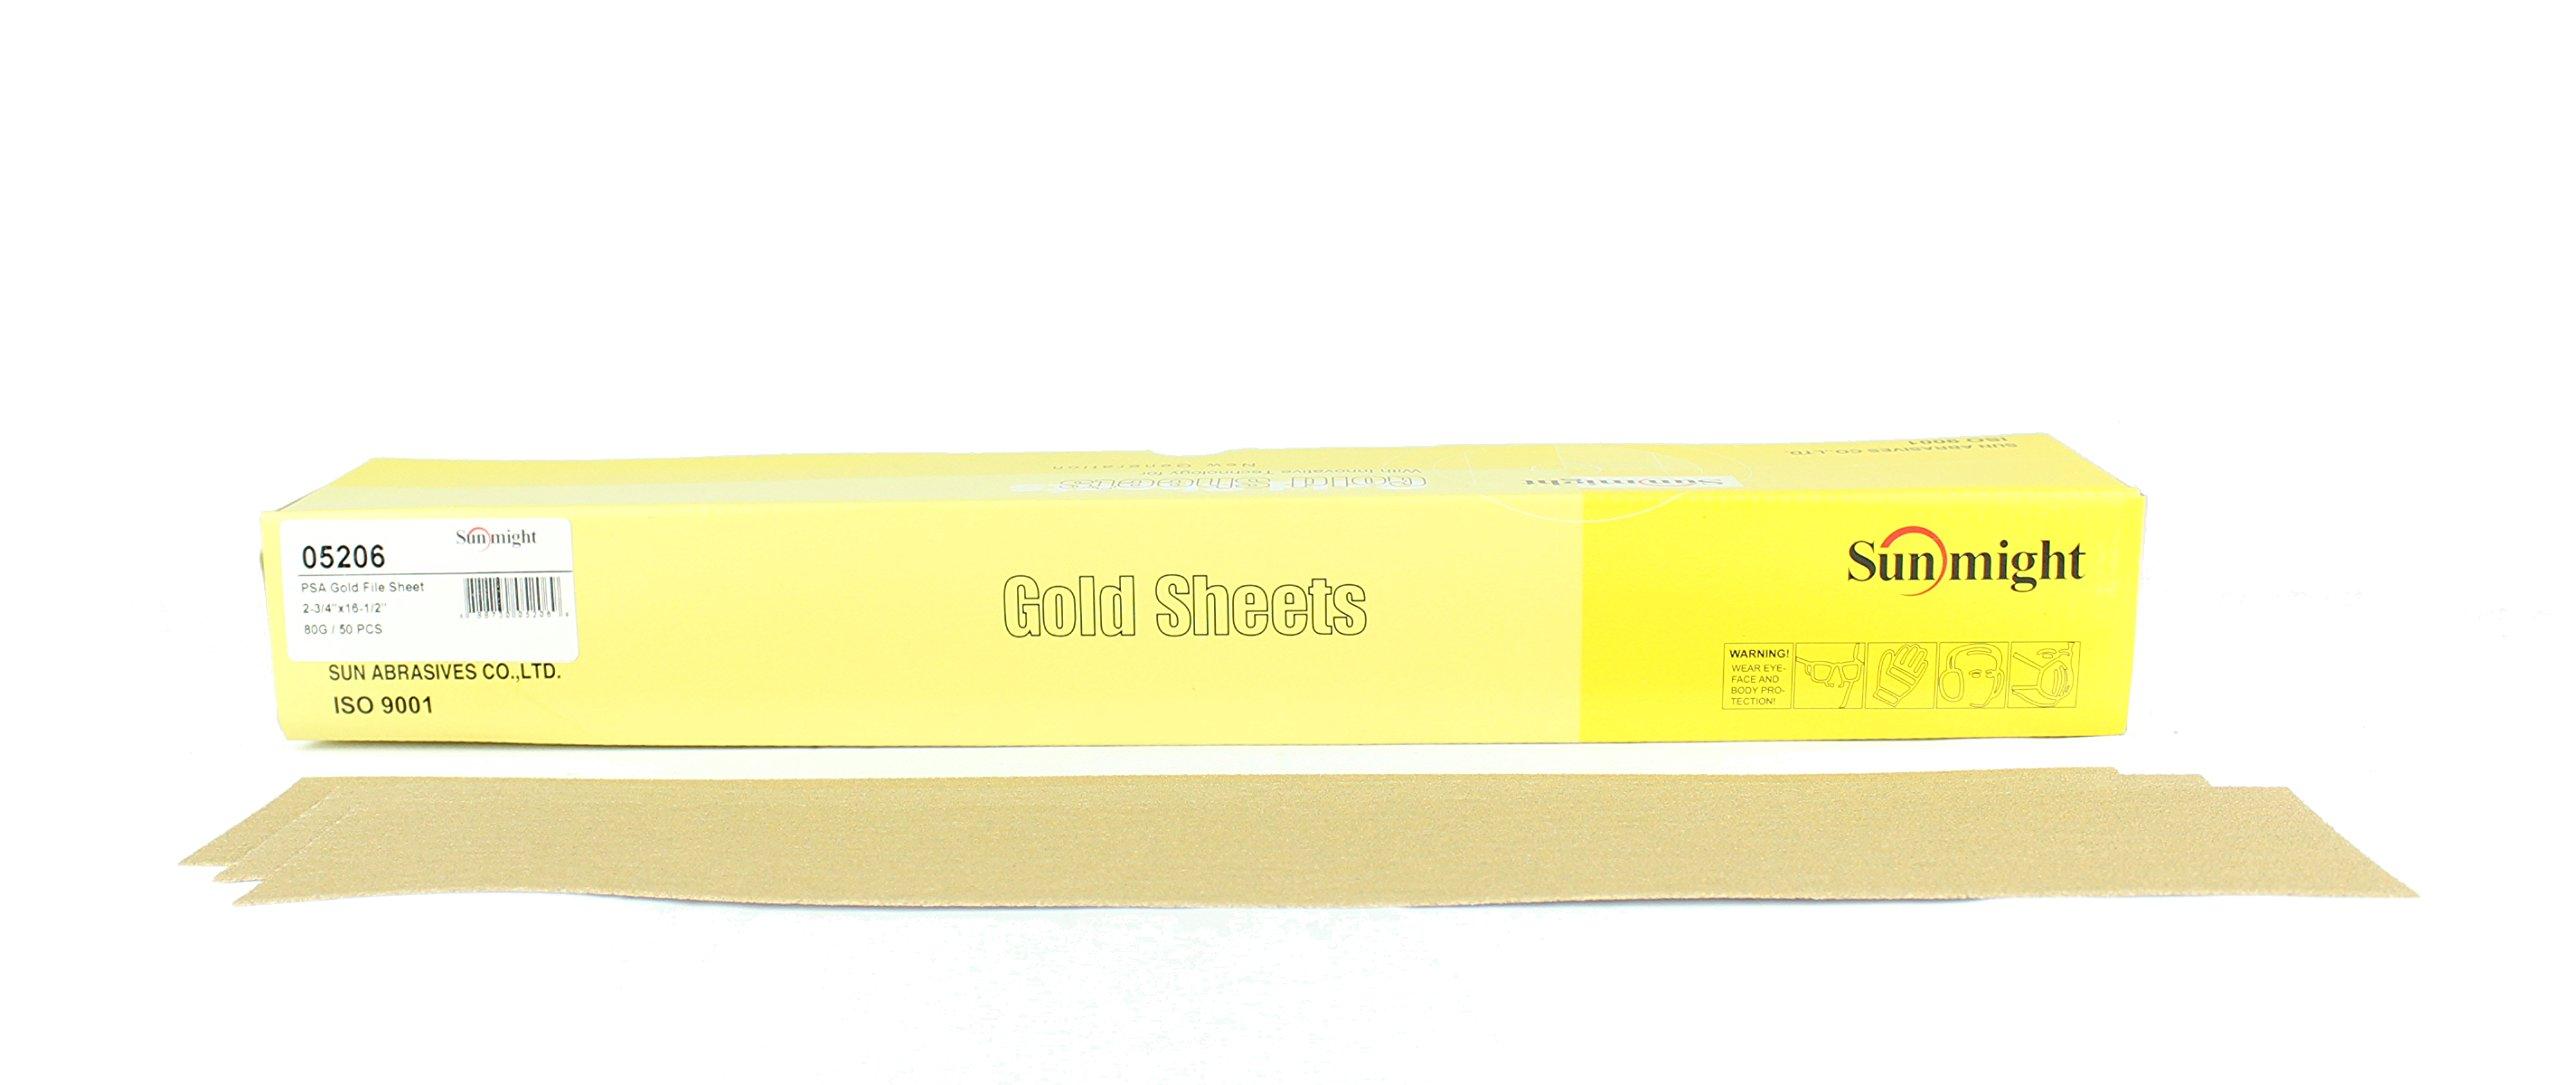 Sunmight 05206 1 Pack 2-3/4'' x 16-1/2'' PSA File Sheet (Gold Grit 80)